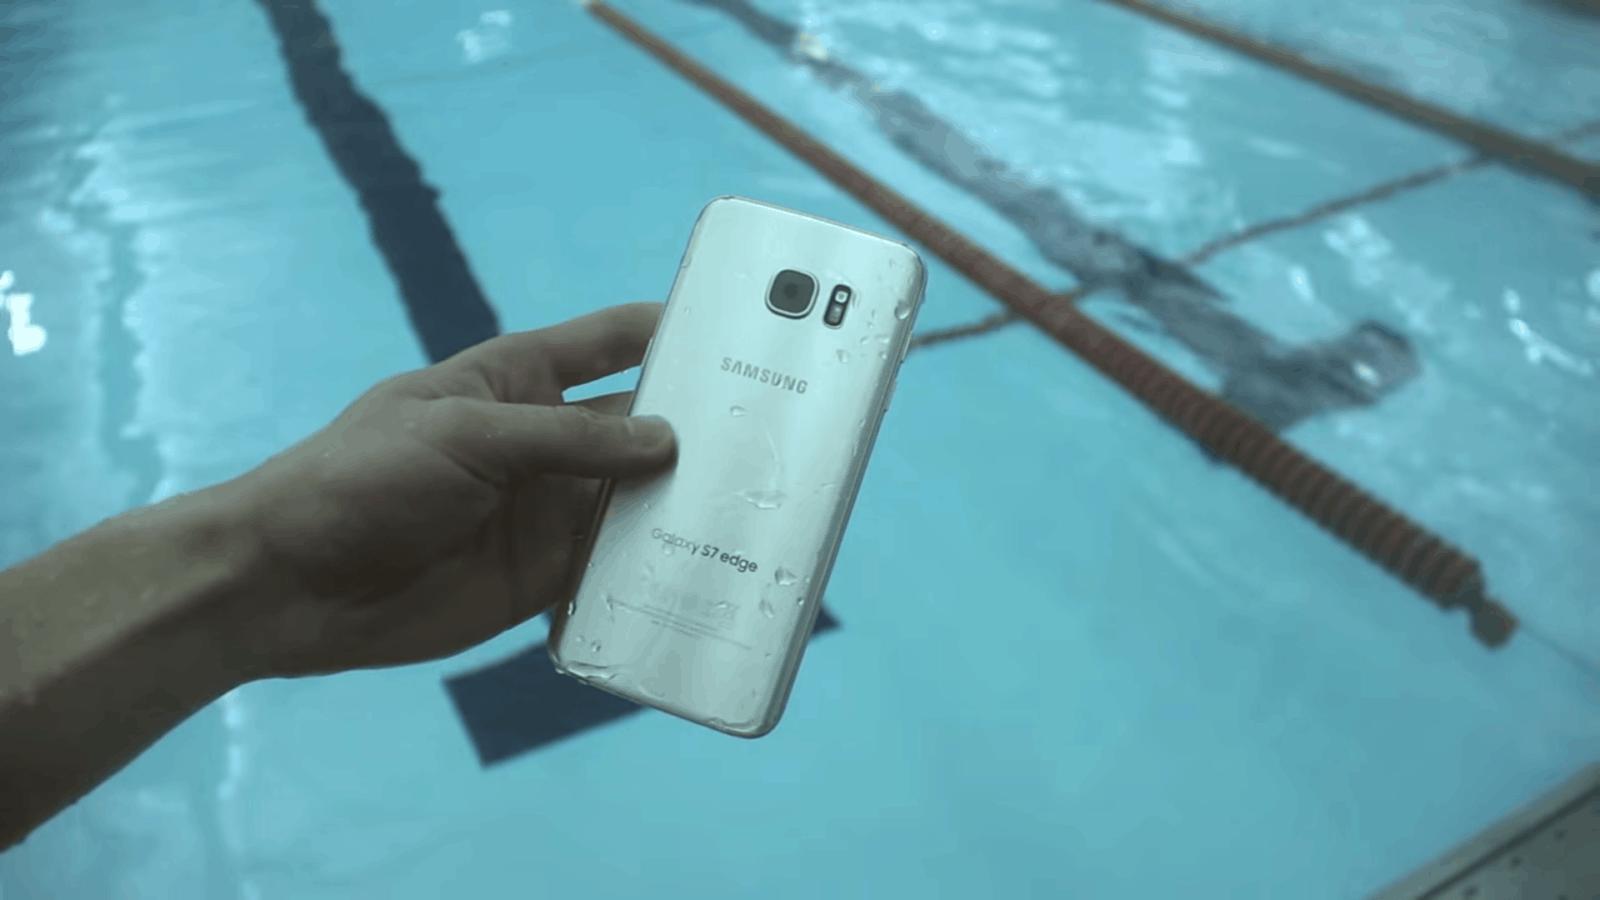 Samsung Galaxy S7 Edge pool test_1